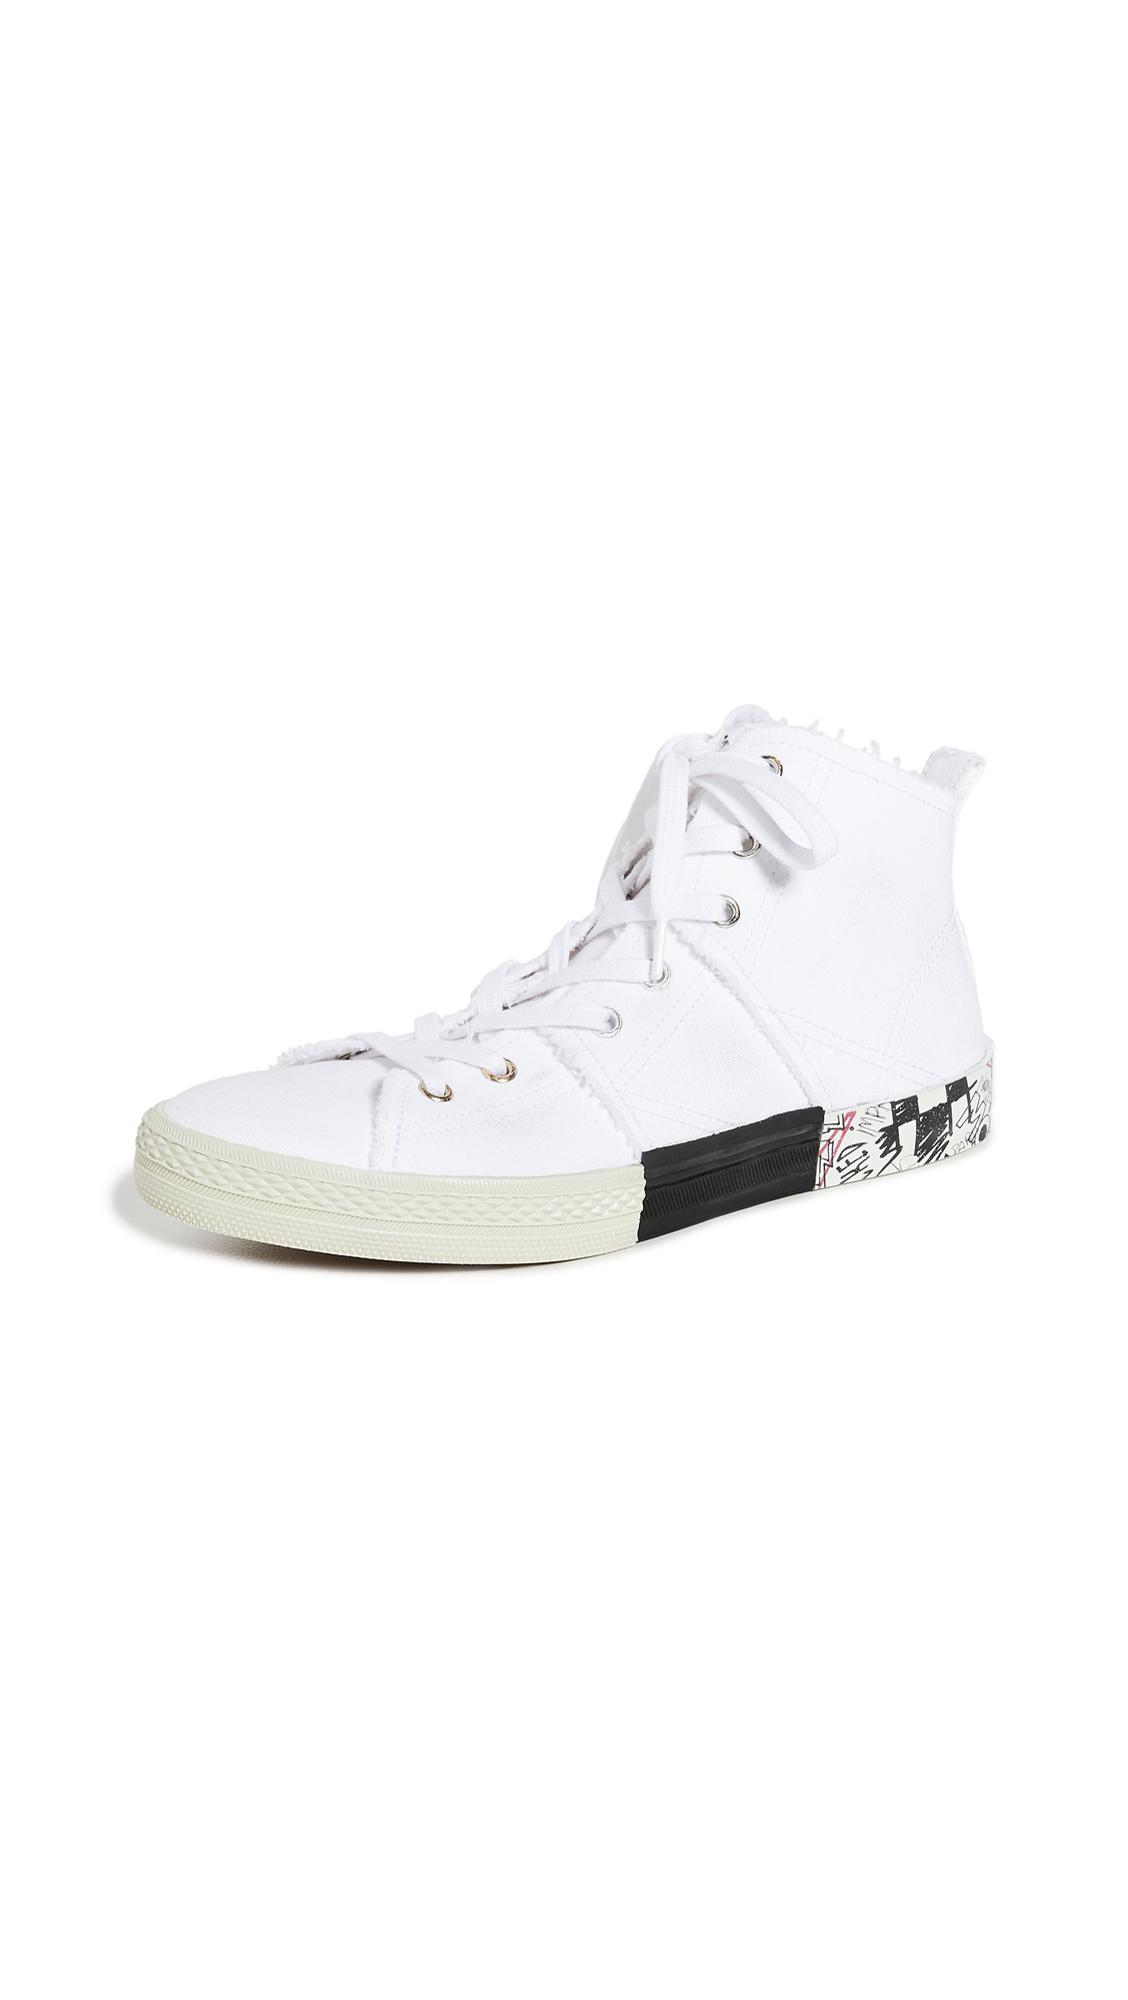 Buy Maison Margiela online - photo of Maison Margiela Layered High Top Sneakers